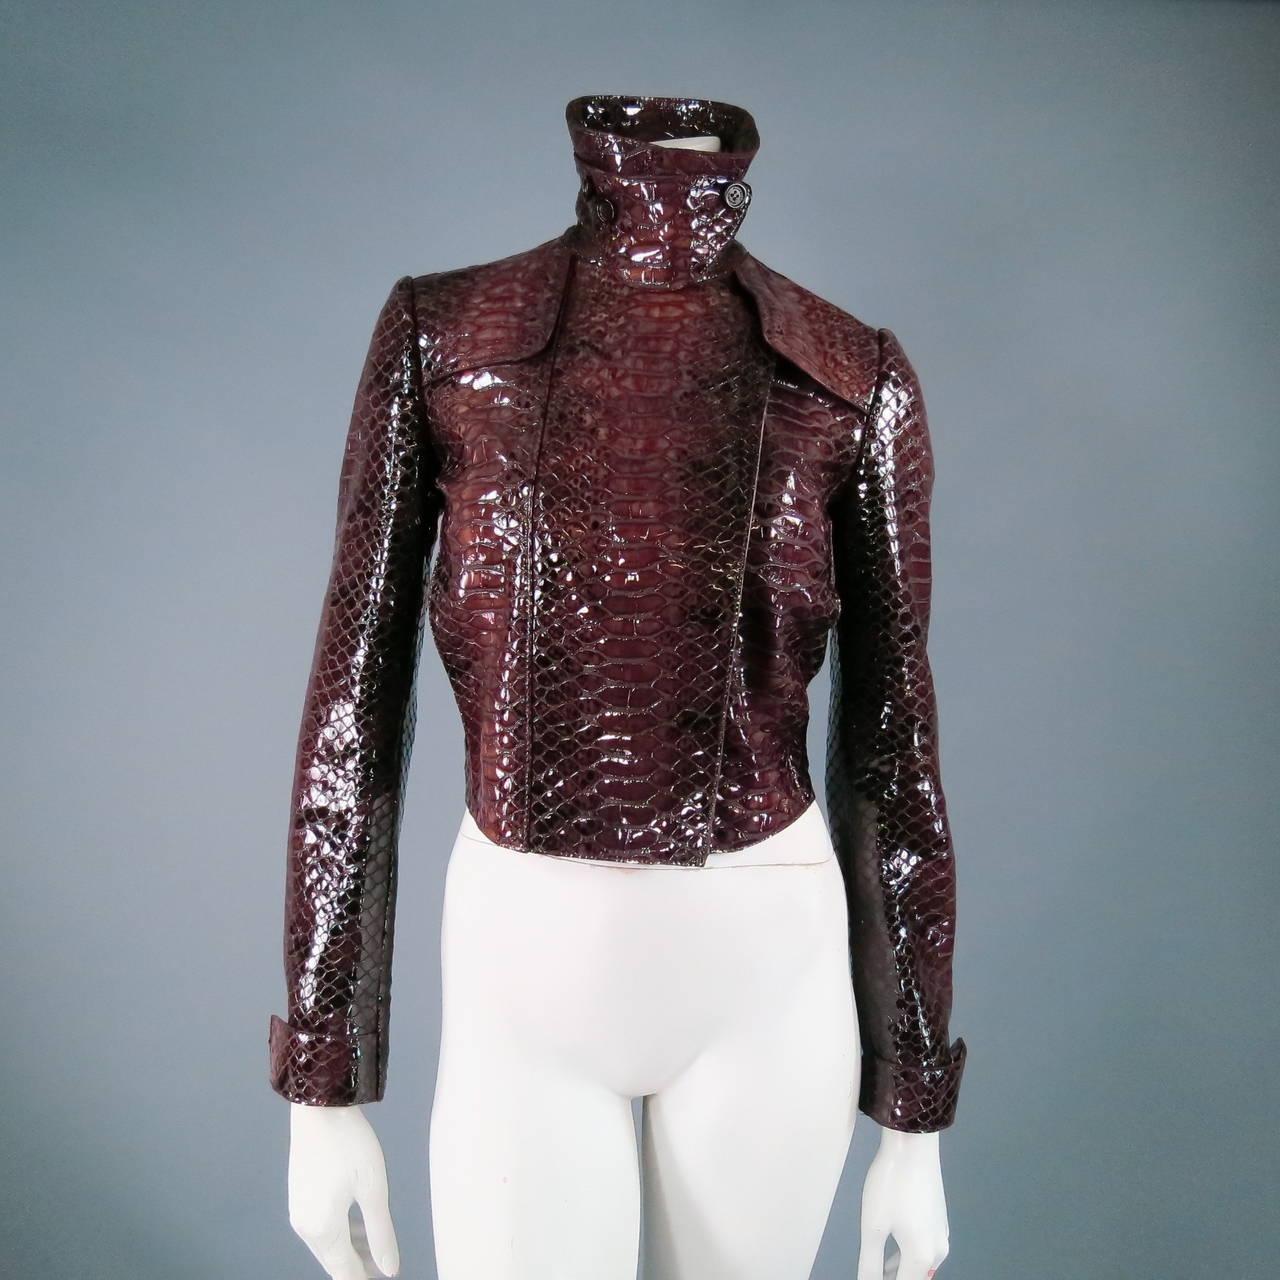 2013's BURBERRY PRORSUM Size 4 Burgundy Python Embossed Patent Leather Jacket 2